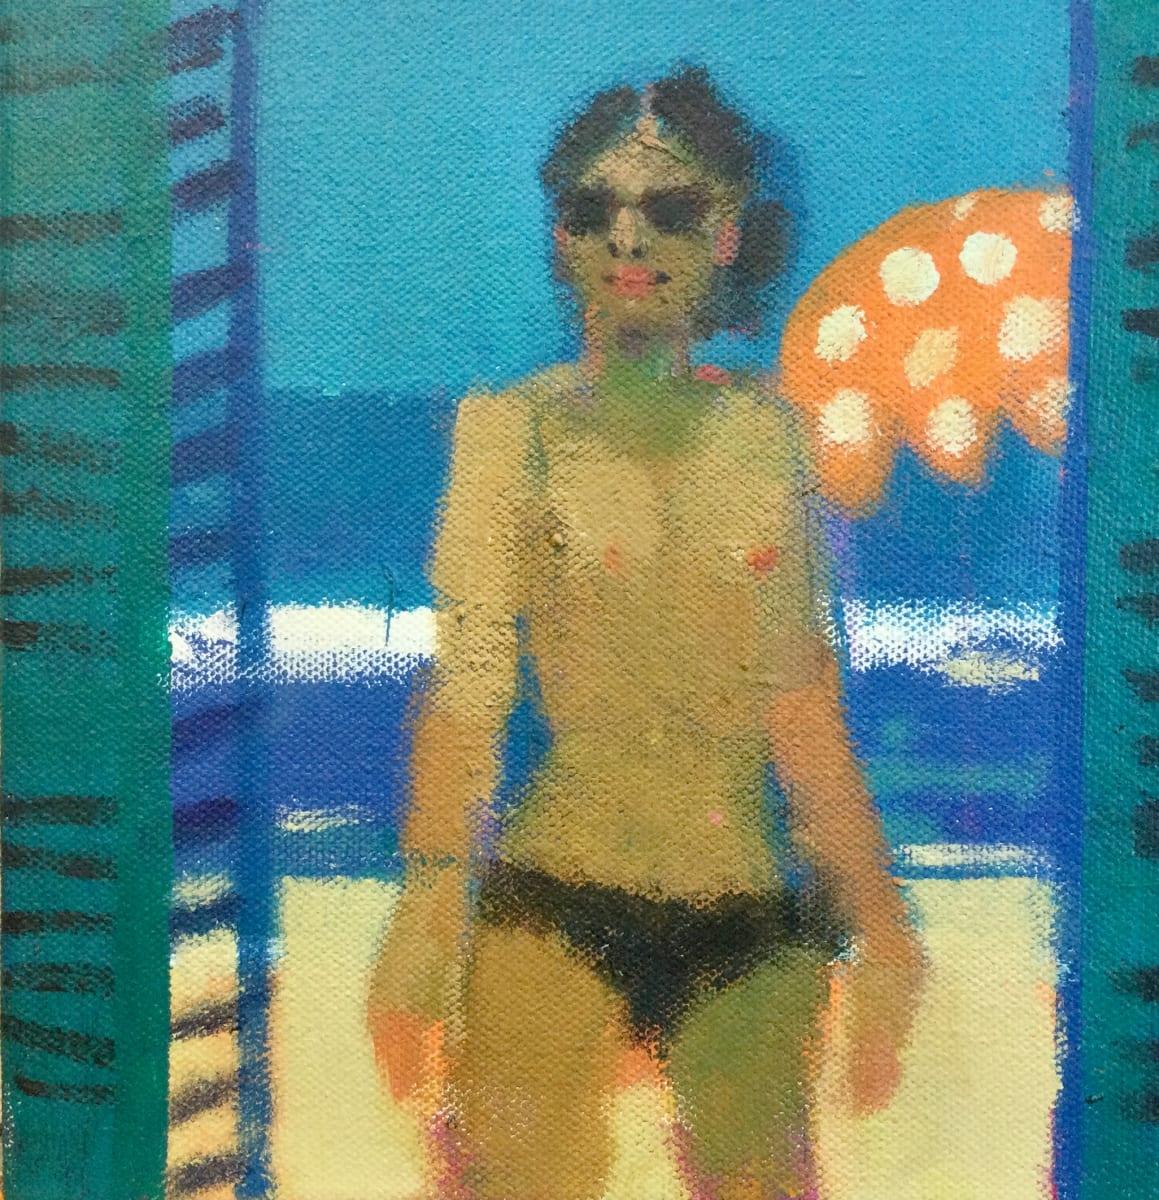 Beach 2 by francis boag